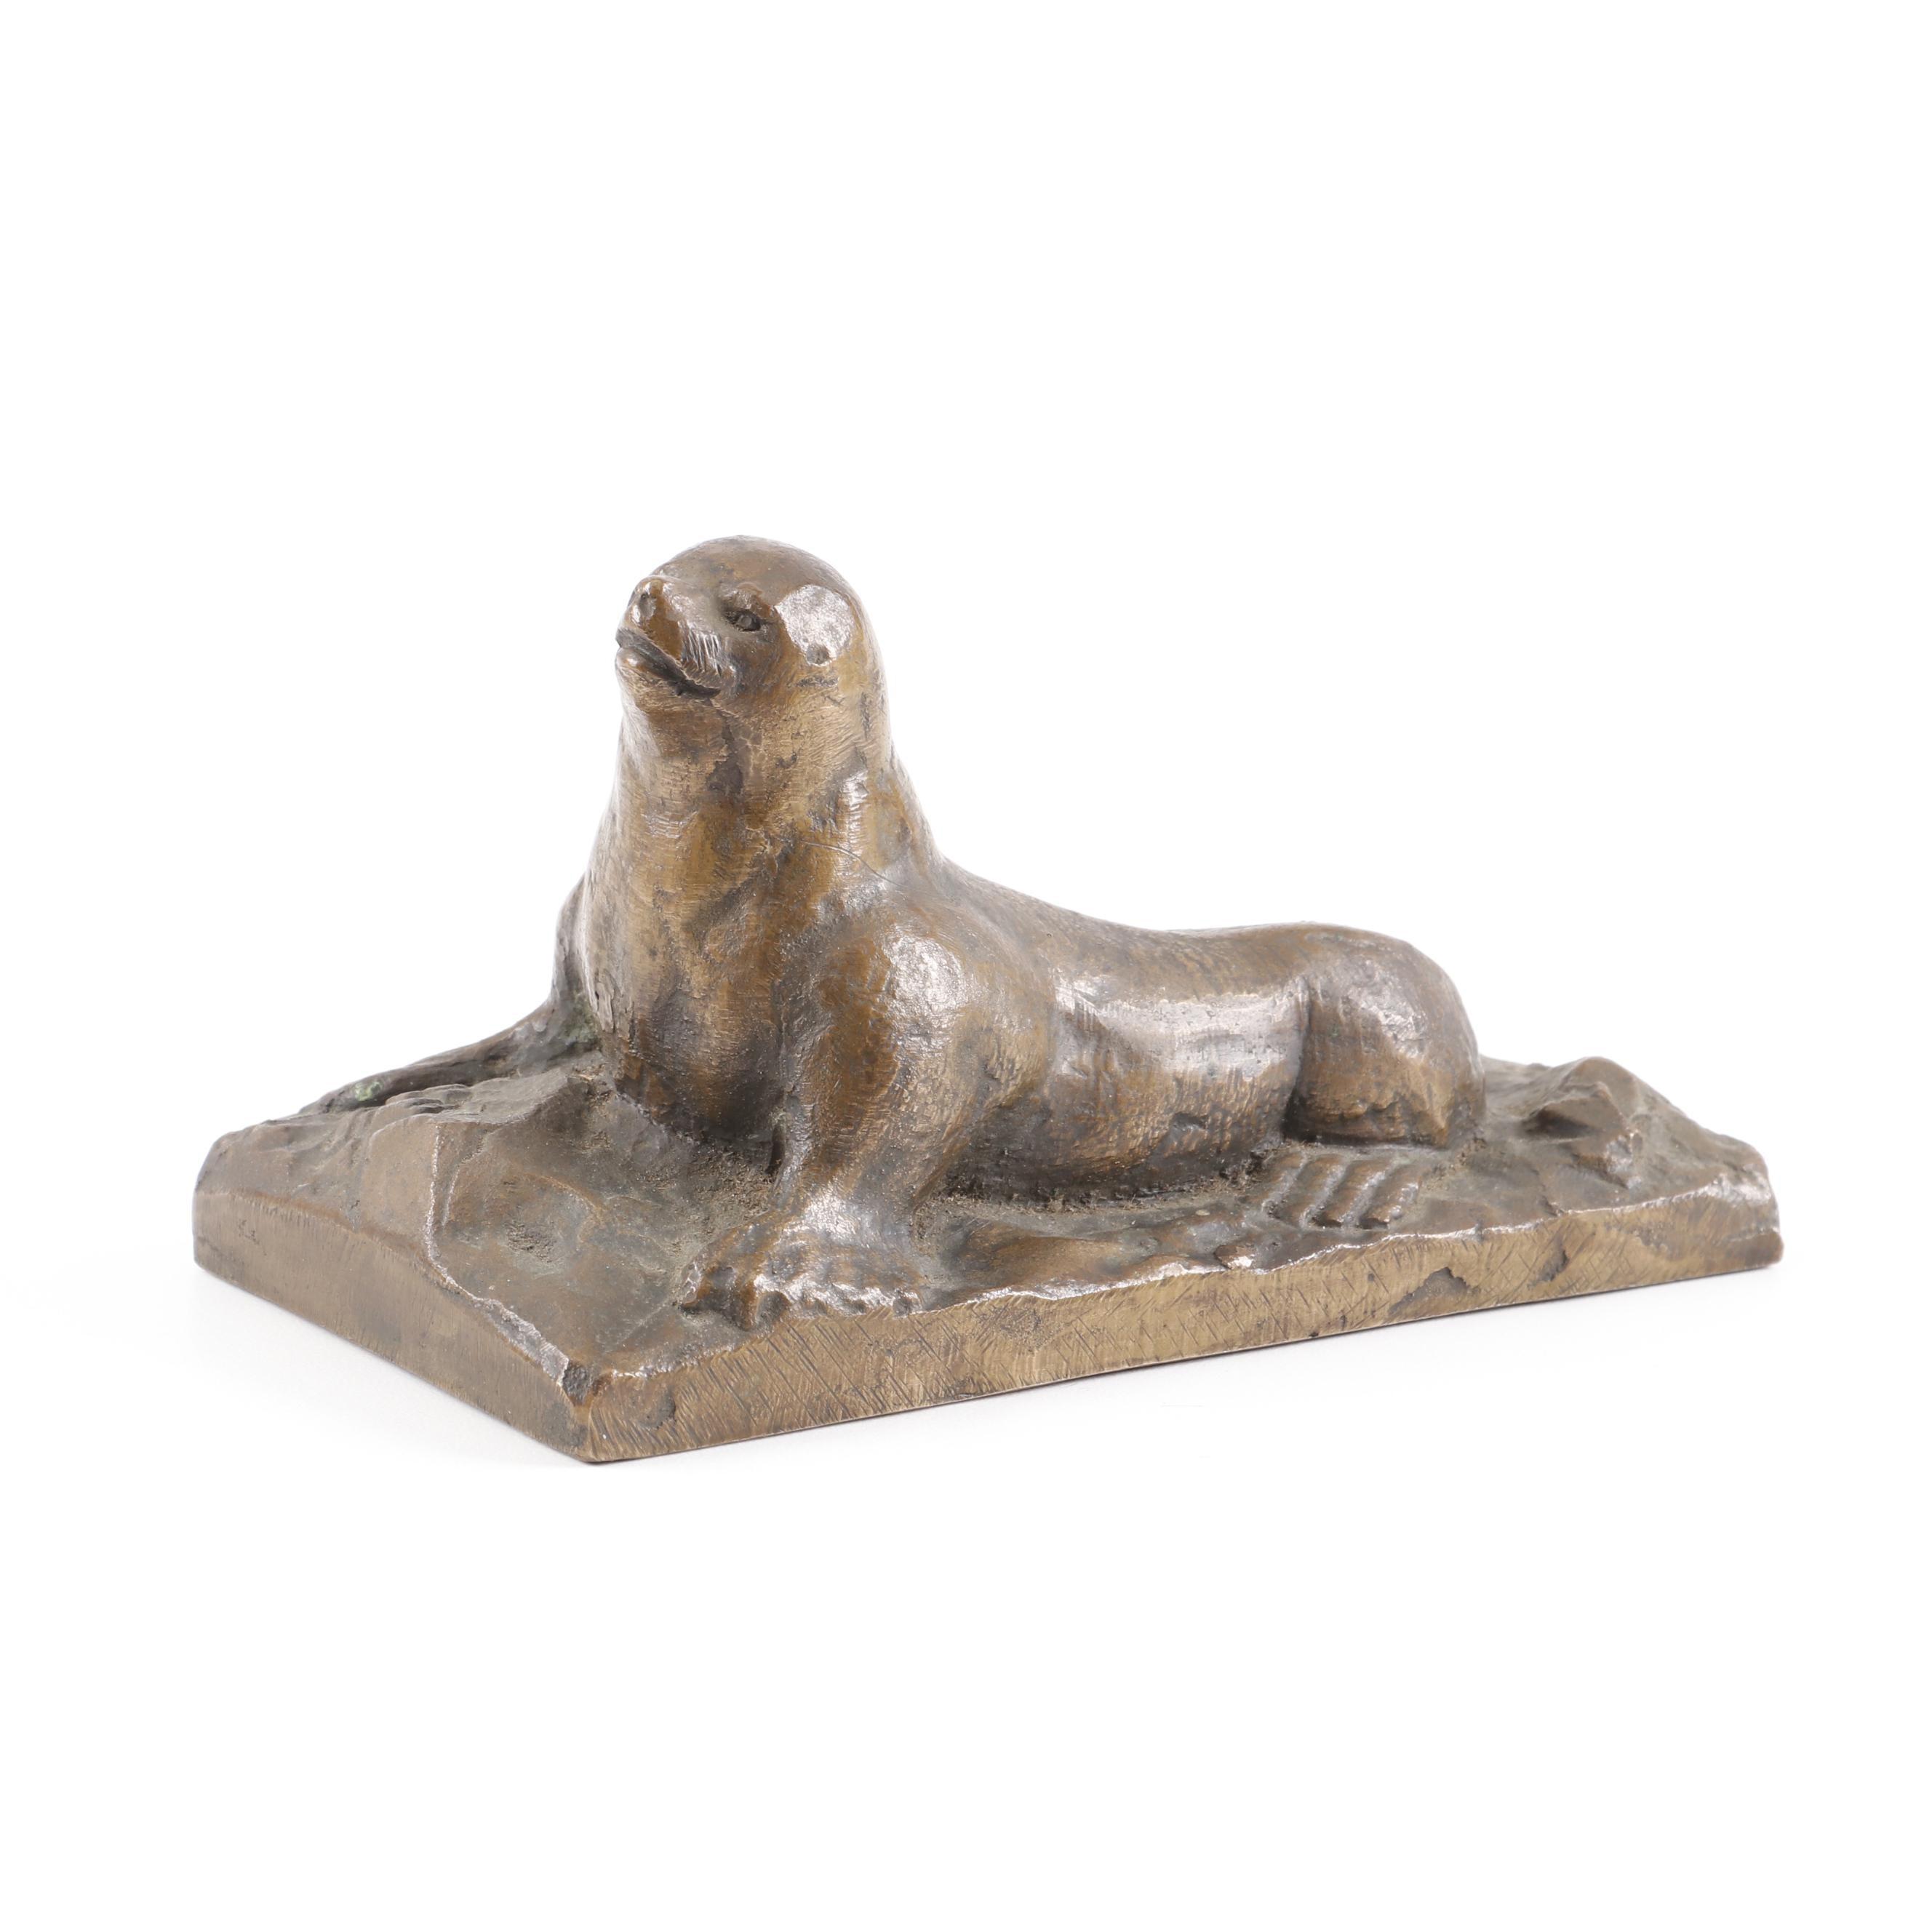 William Hoppe Bronze Sculpture of a Sea Lion